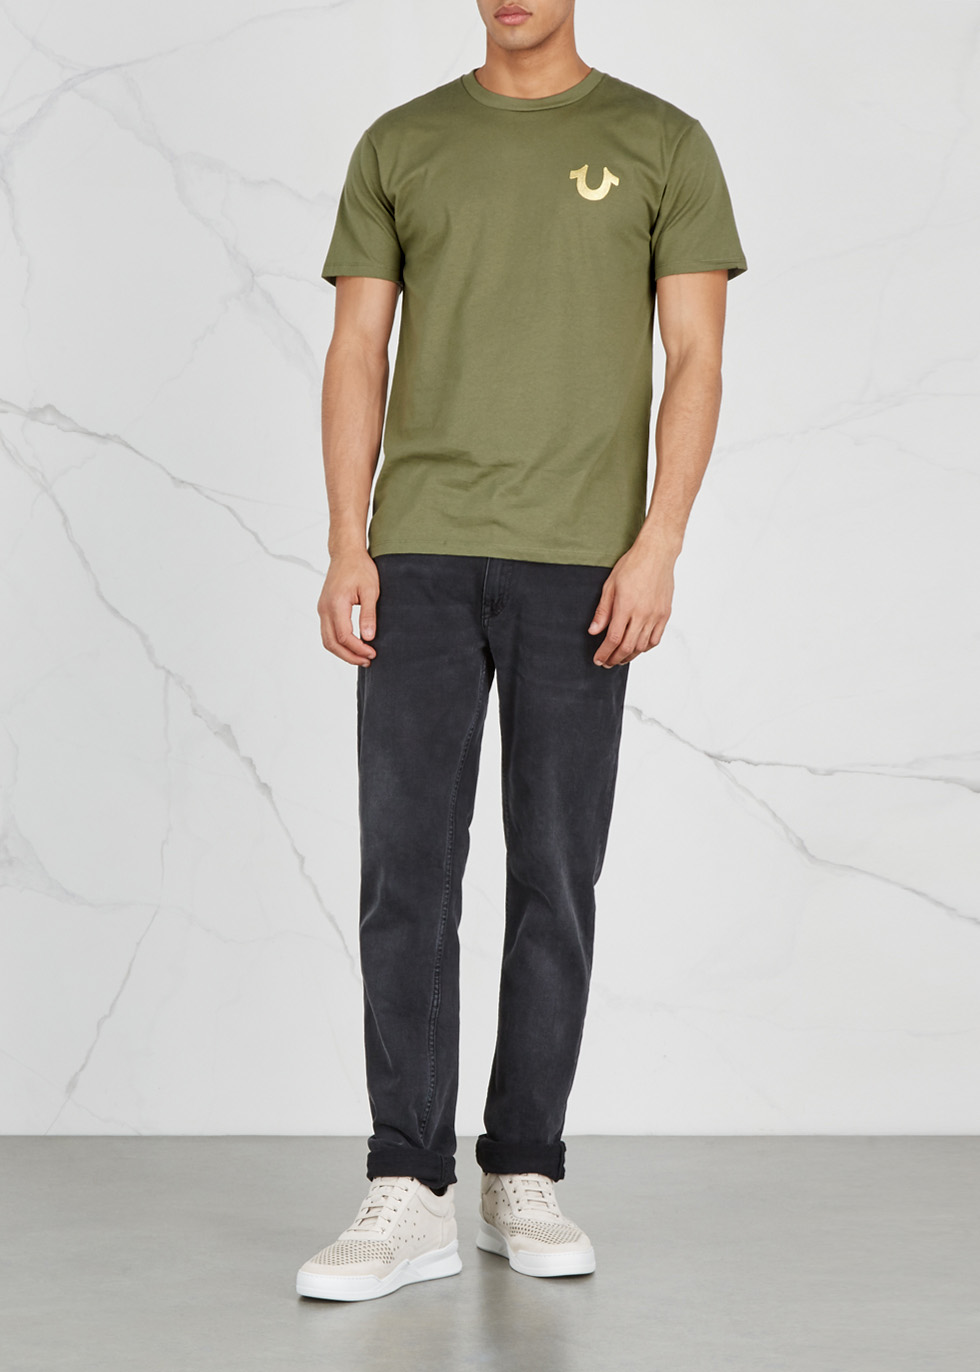 True Religion Jeans T Shirts Tracksuits Jackets Harvey Nichols